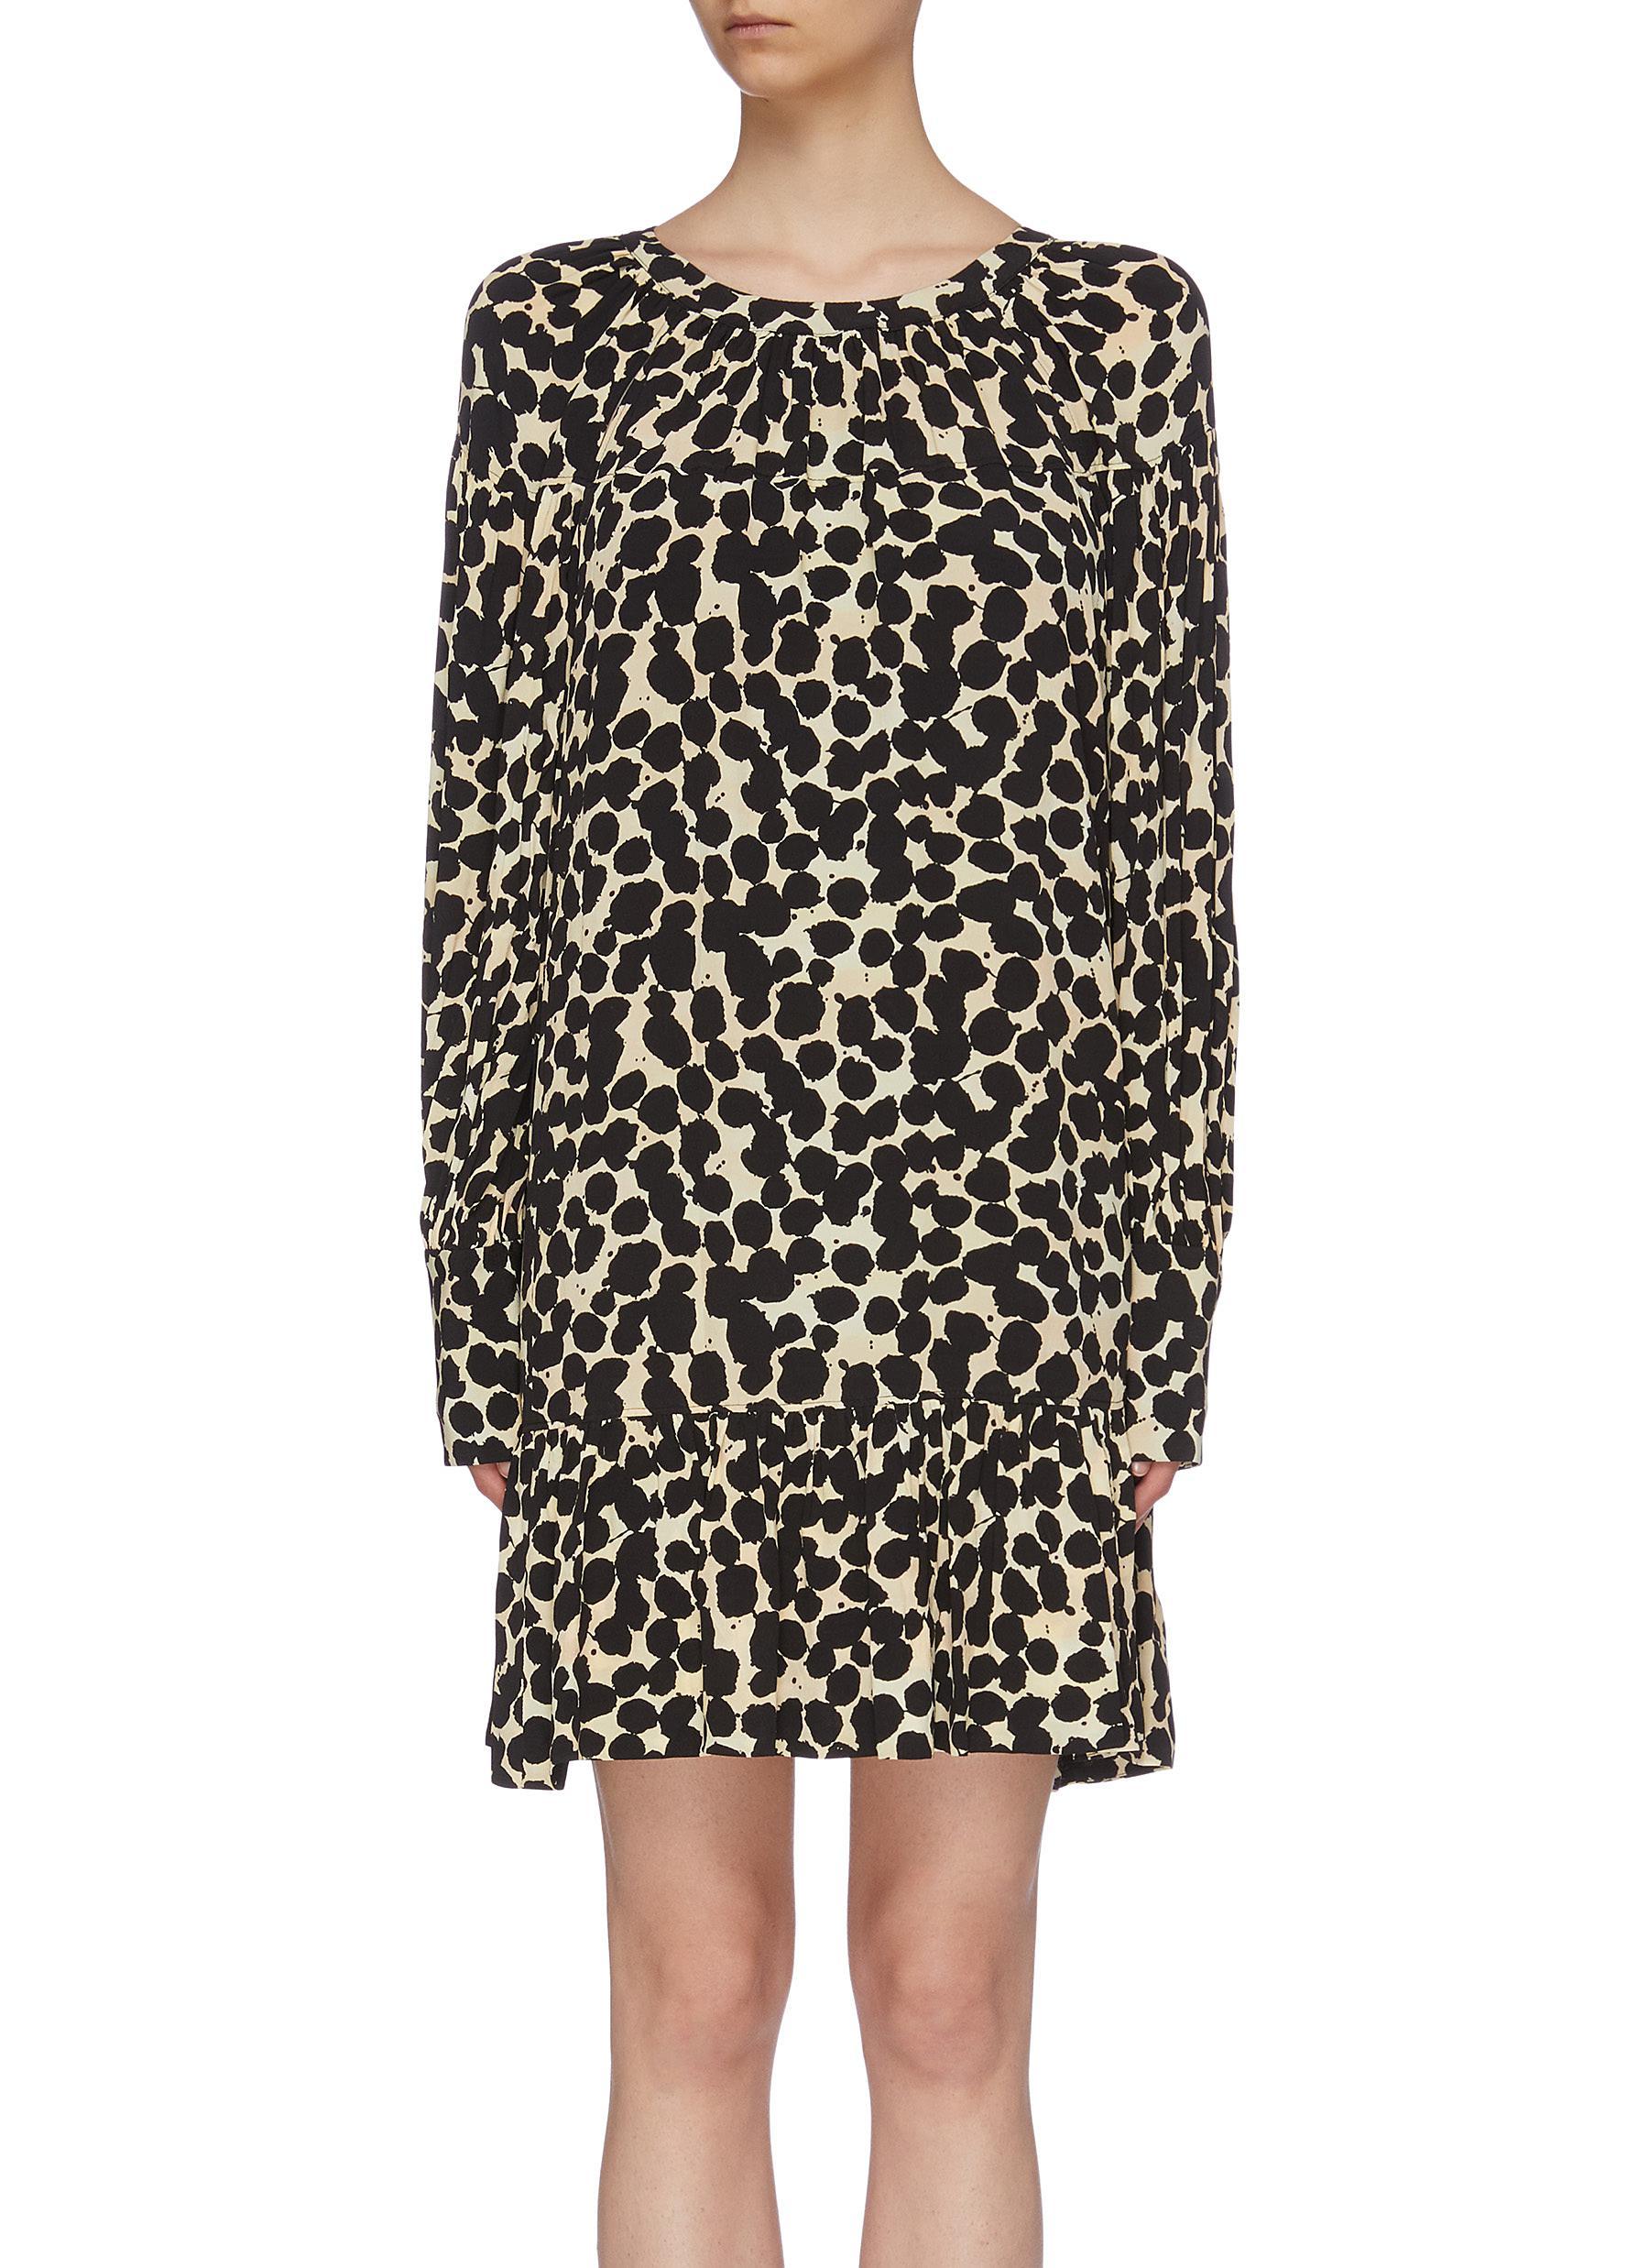 Tie cutout back dot print crepe mini dress by Proenza Schouler